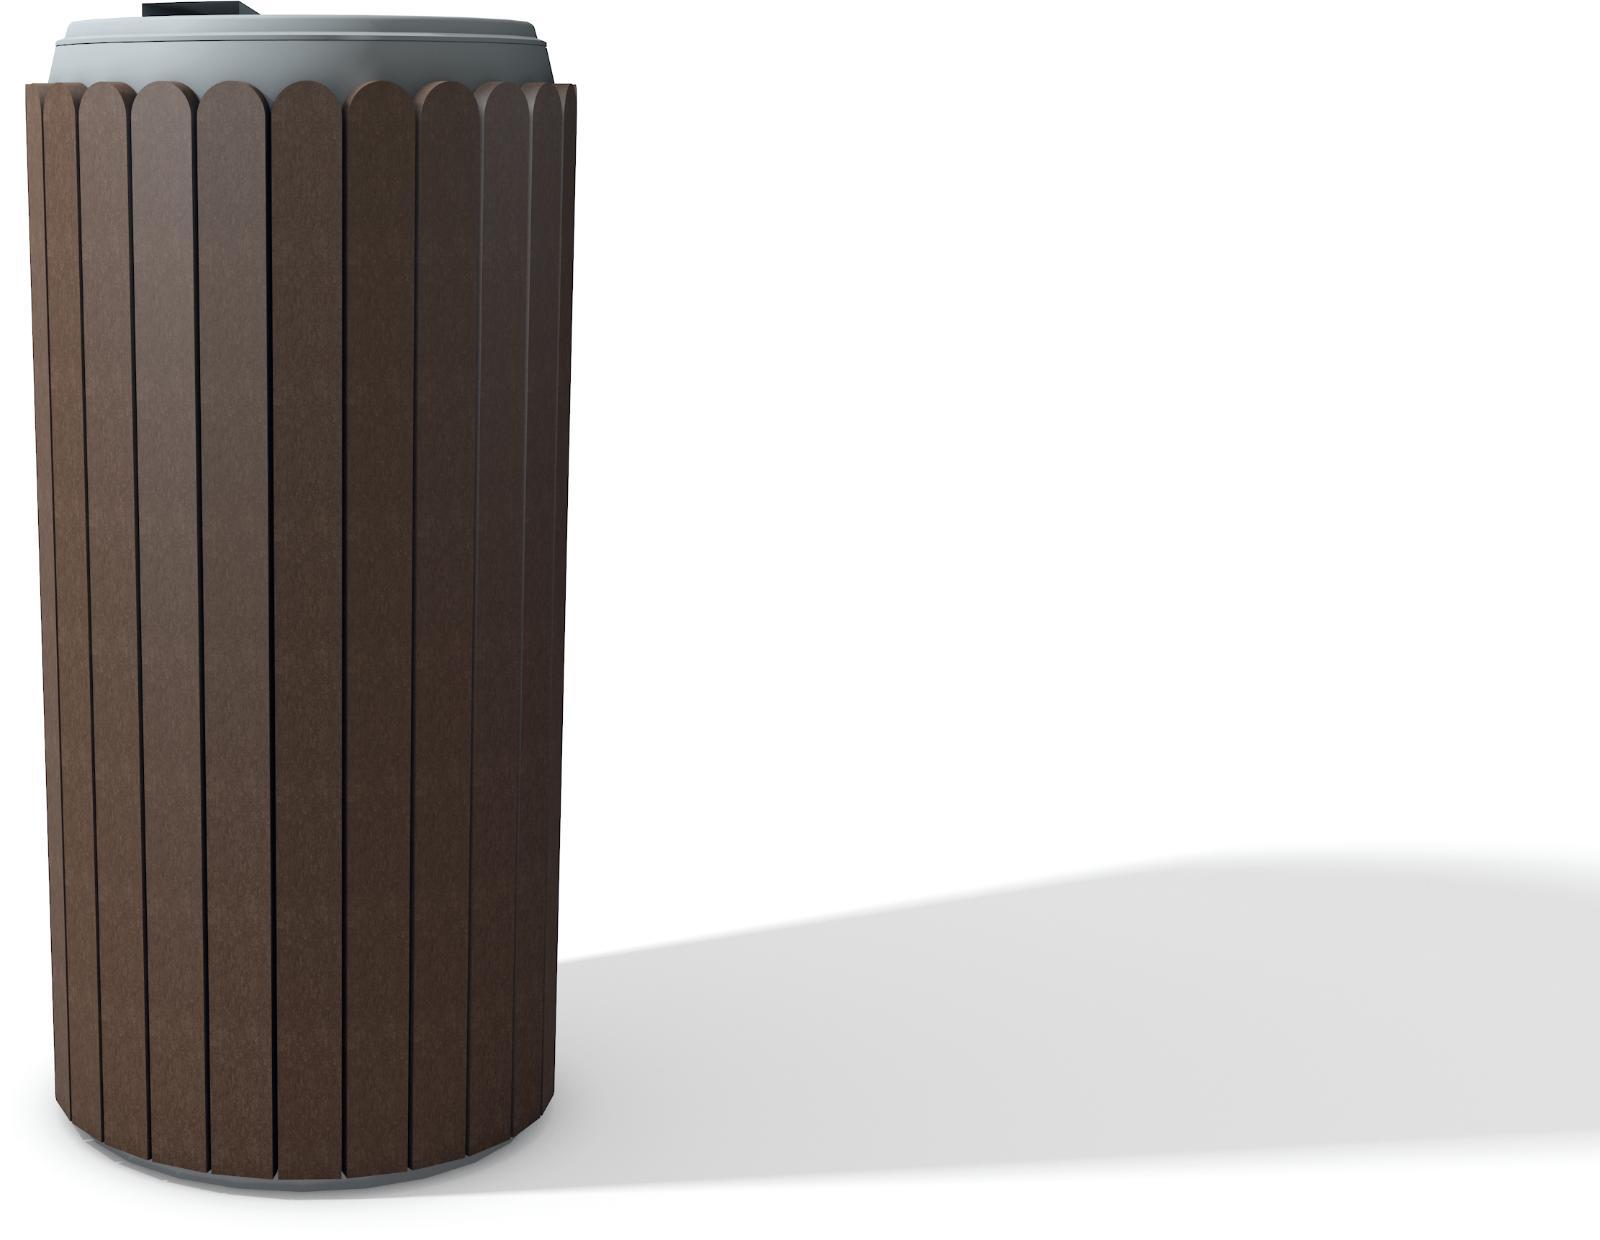 abfallbeh lter parki mit deckel kunststoff abfallbeh lter au enbereich abfallbeh lter. Black Bedroom Furniture Sets. Home Design Ideas